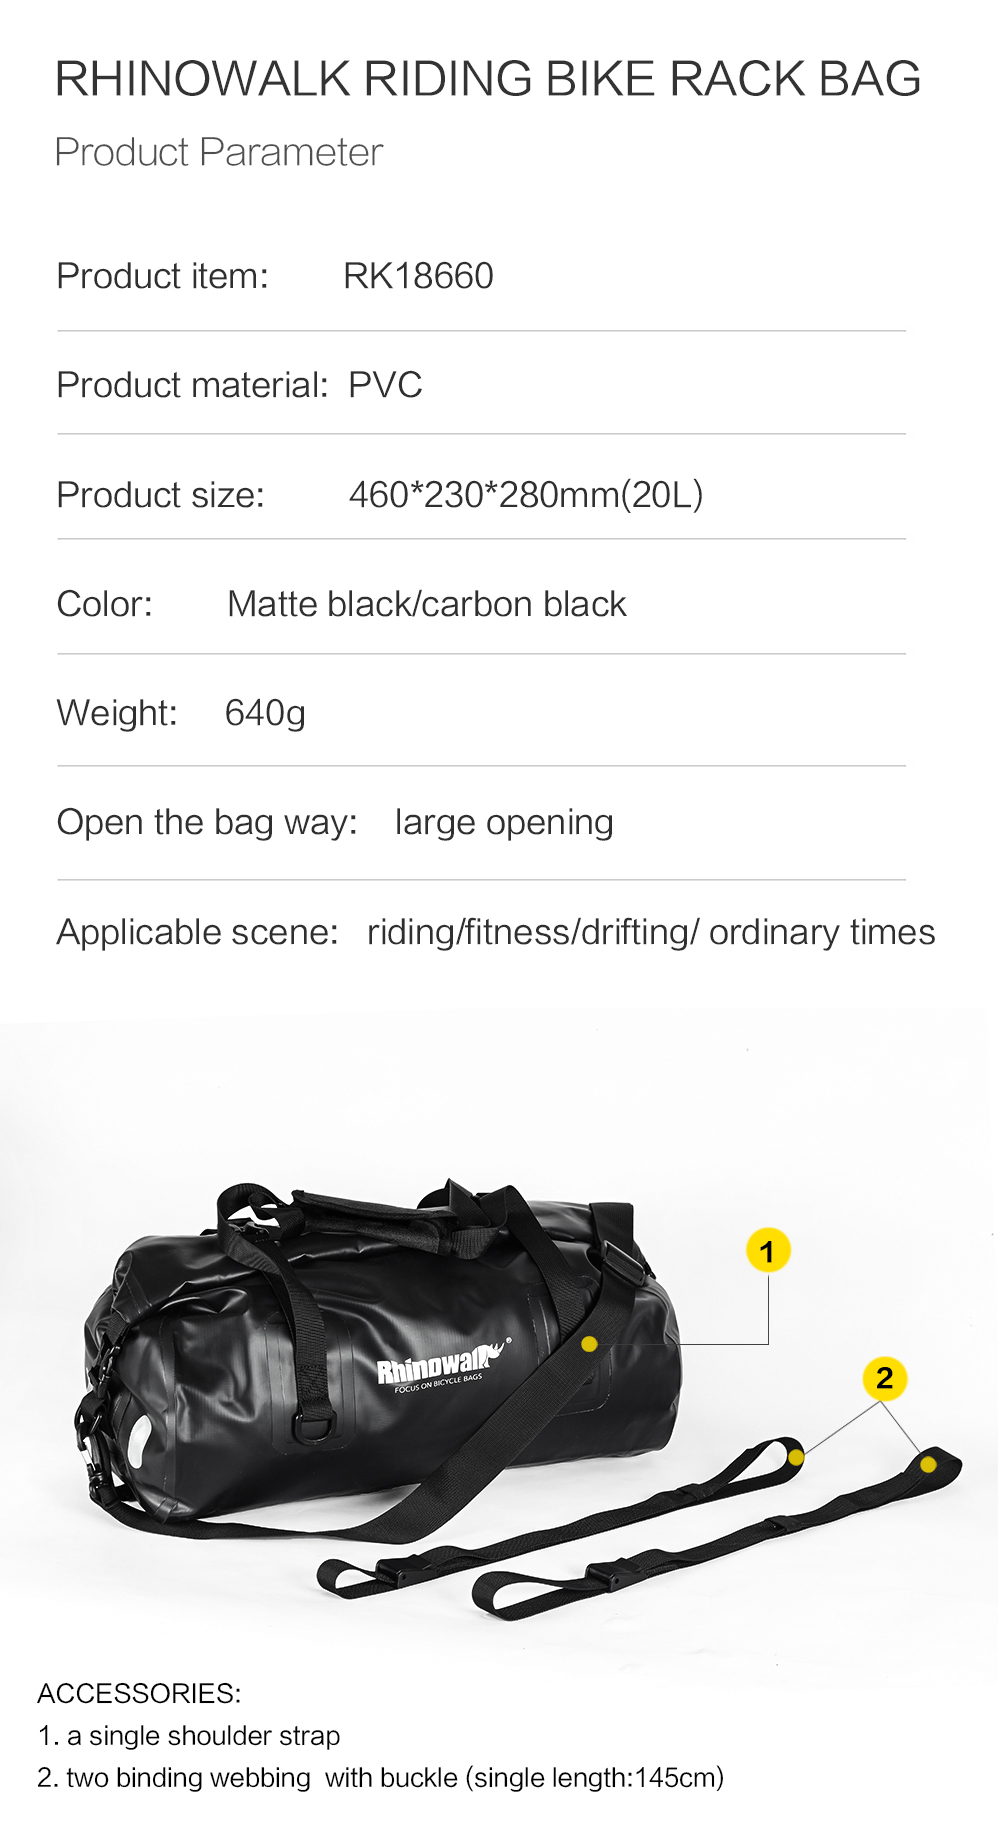 Rhinowalk Bicycle Luggage Bags 20L Full Waterproof for Road Bike Rear Rack Trunk Cycling Saddle Storage Pannier Multi Travel Bag (9)